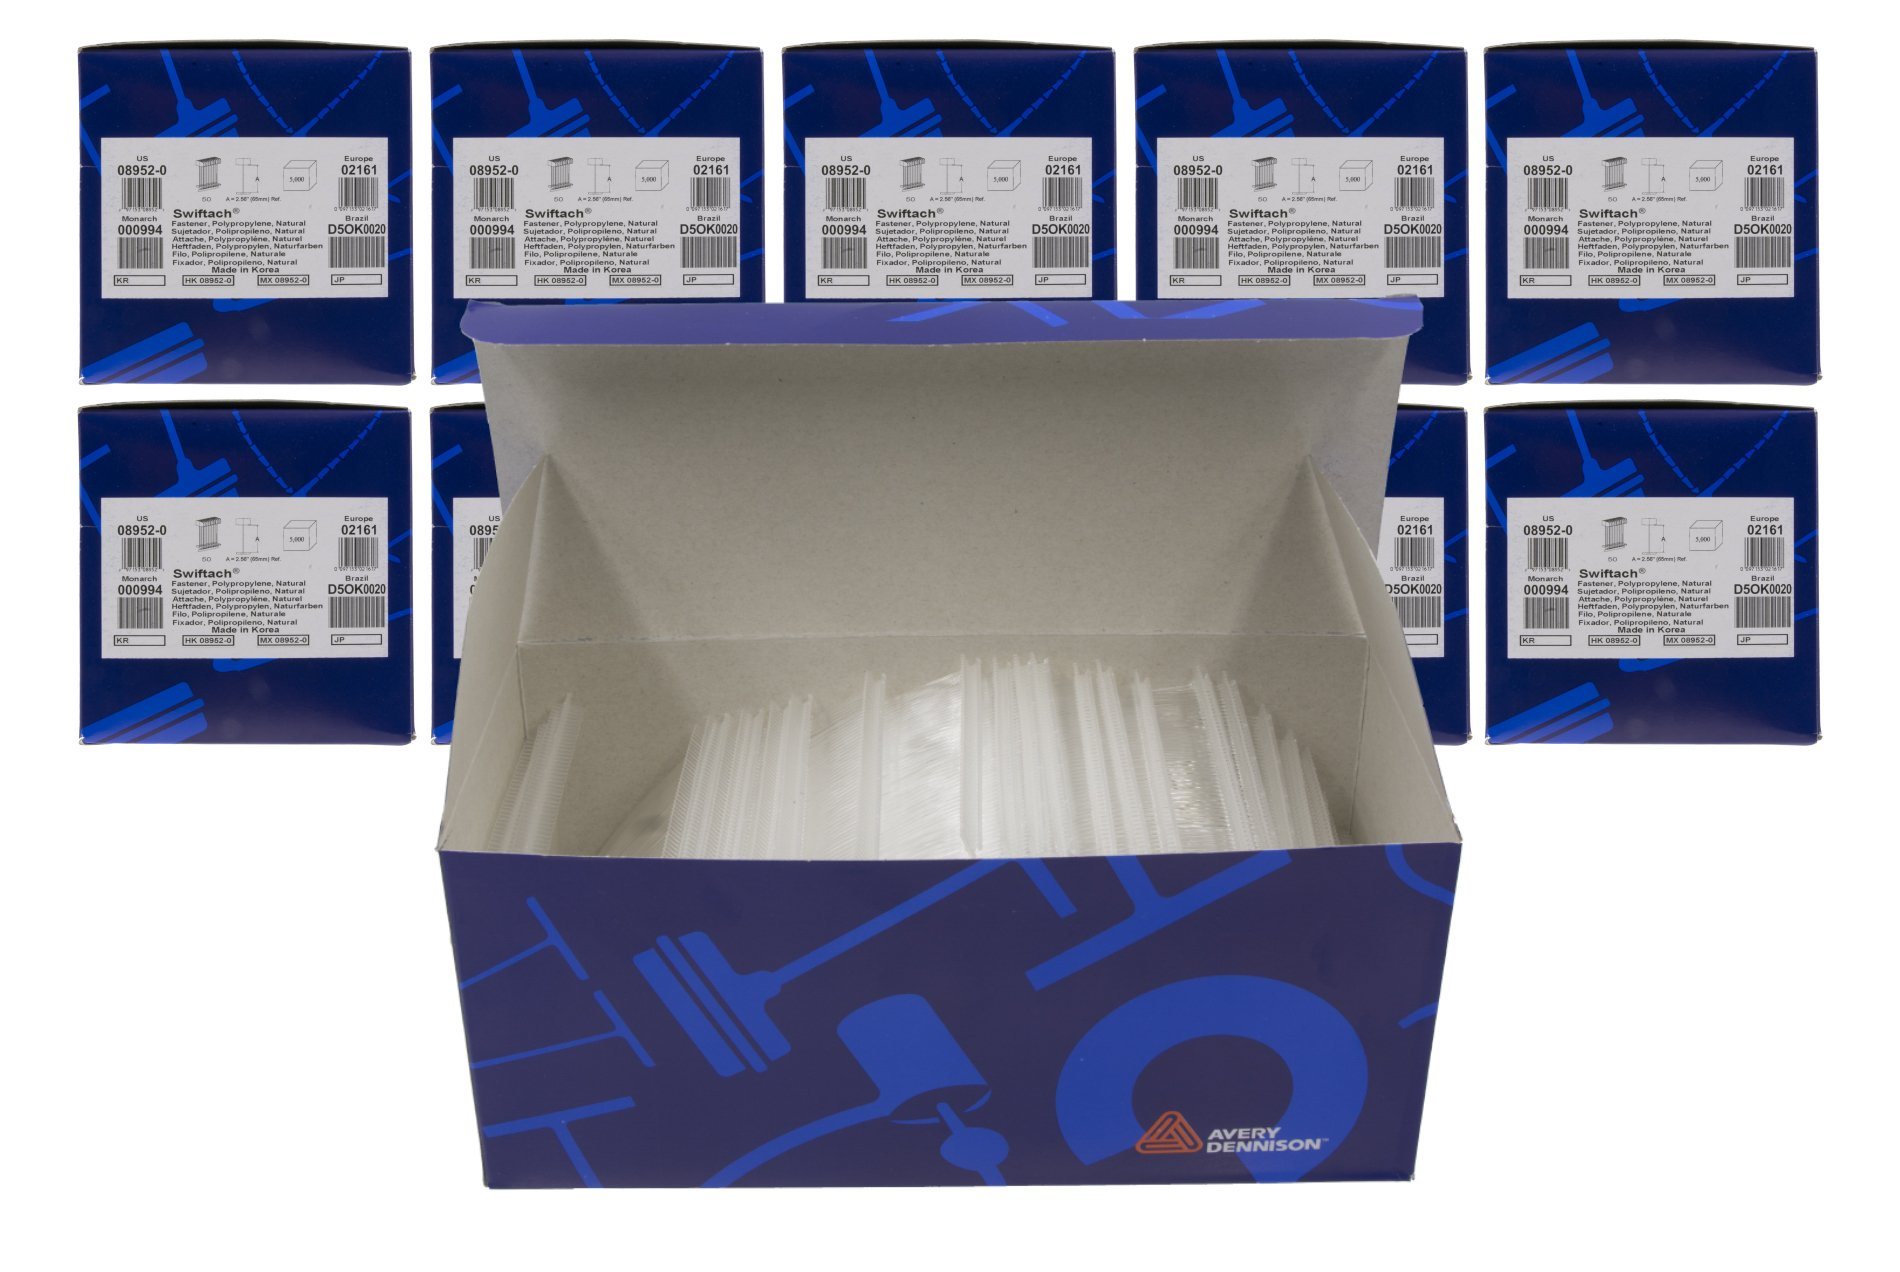 10-Pack of Avery Dennison 3'' Swiftach Tagging Gun Barbs / Fasteners – 5,000 Fasteners Per Box = 50,000 Fasteners – Genuine Avery Dennison # 08952